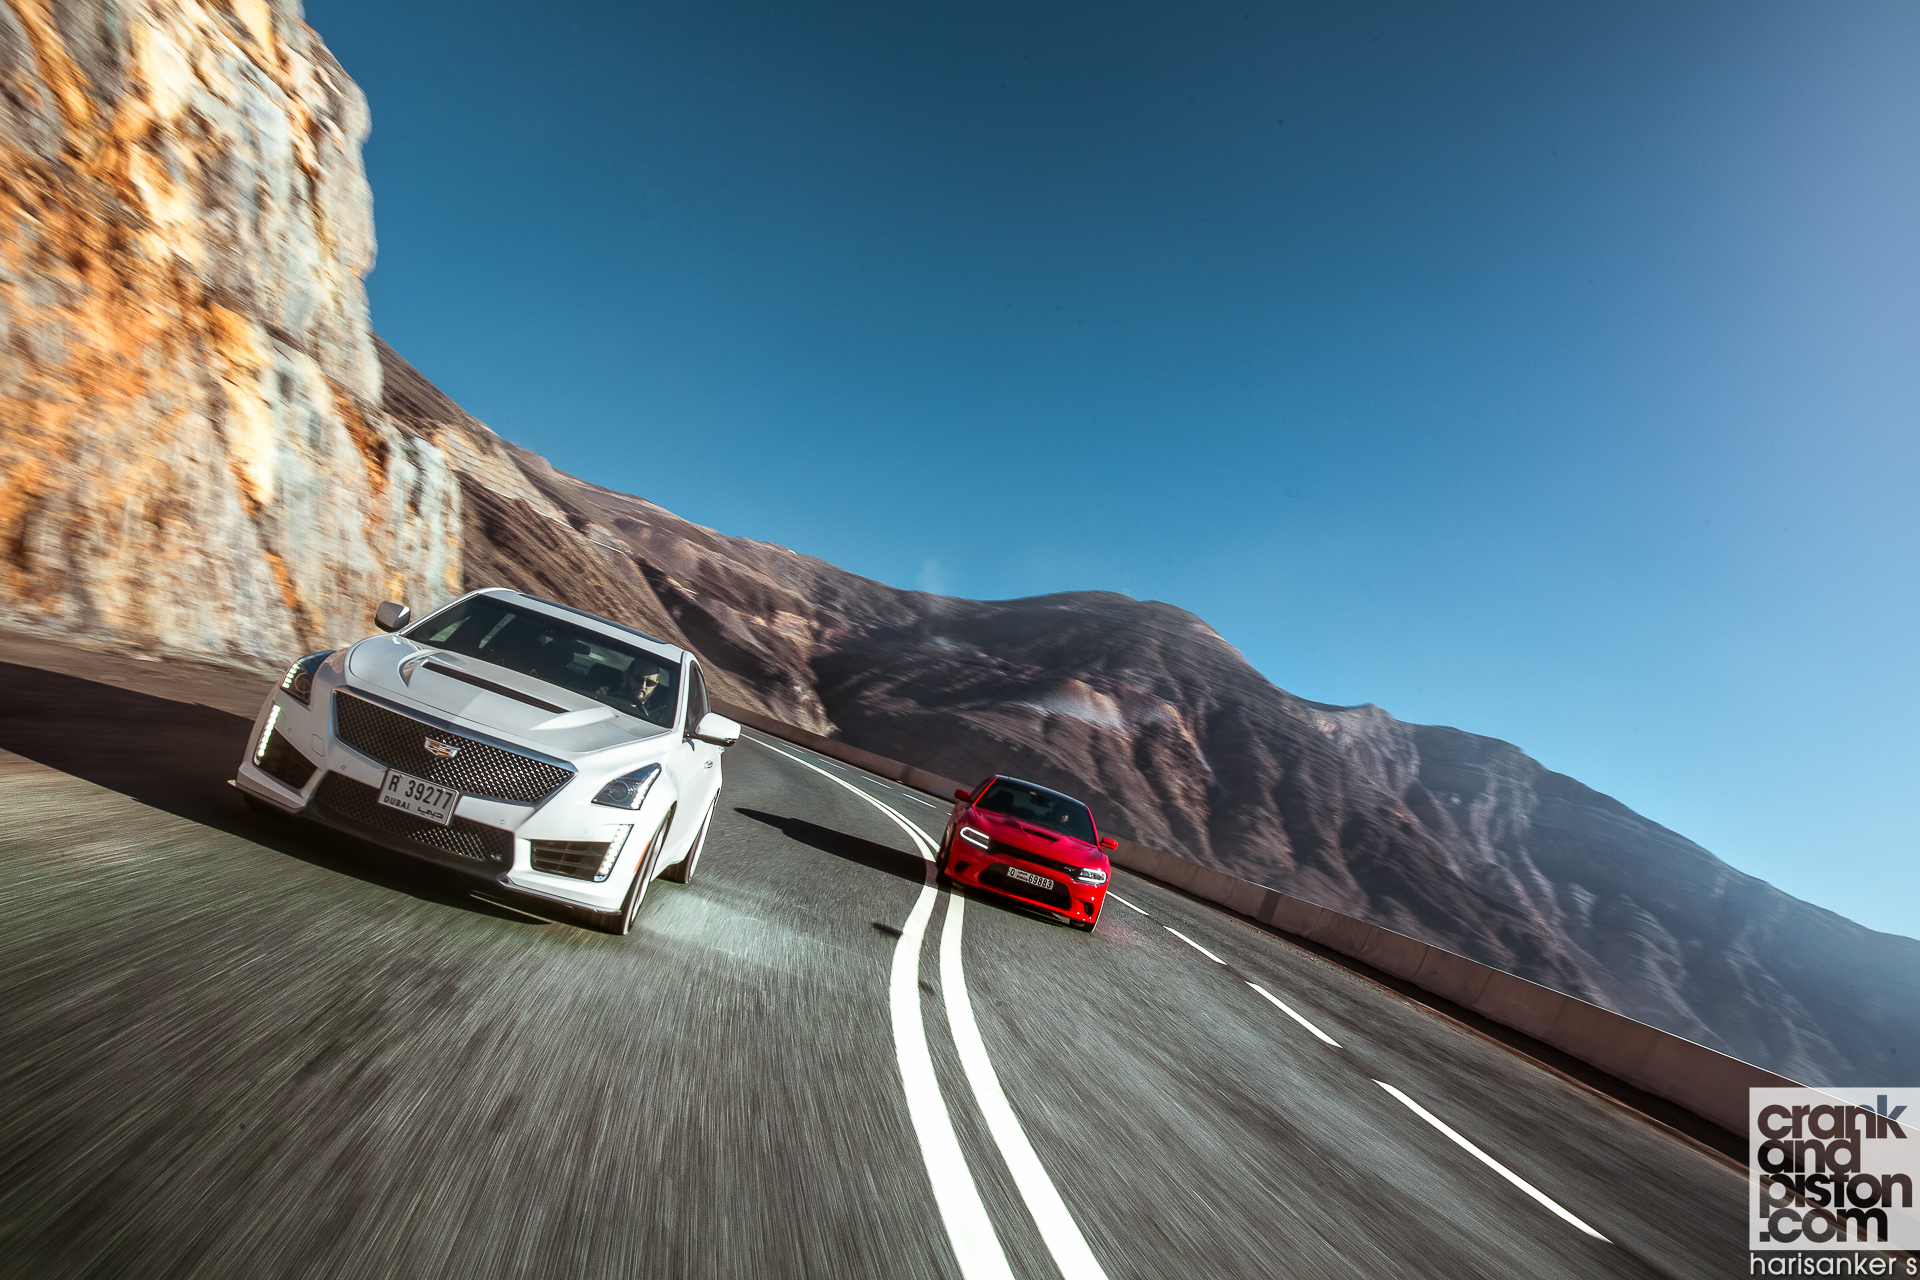 Cadillac CTS-V vs Dodge Charger SRT Hellcat WALLPAPERS crankandpiston-5